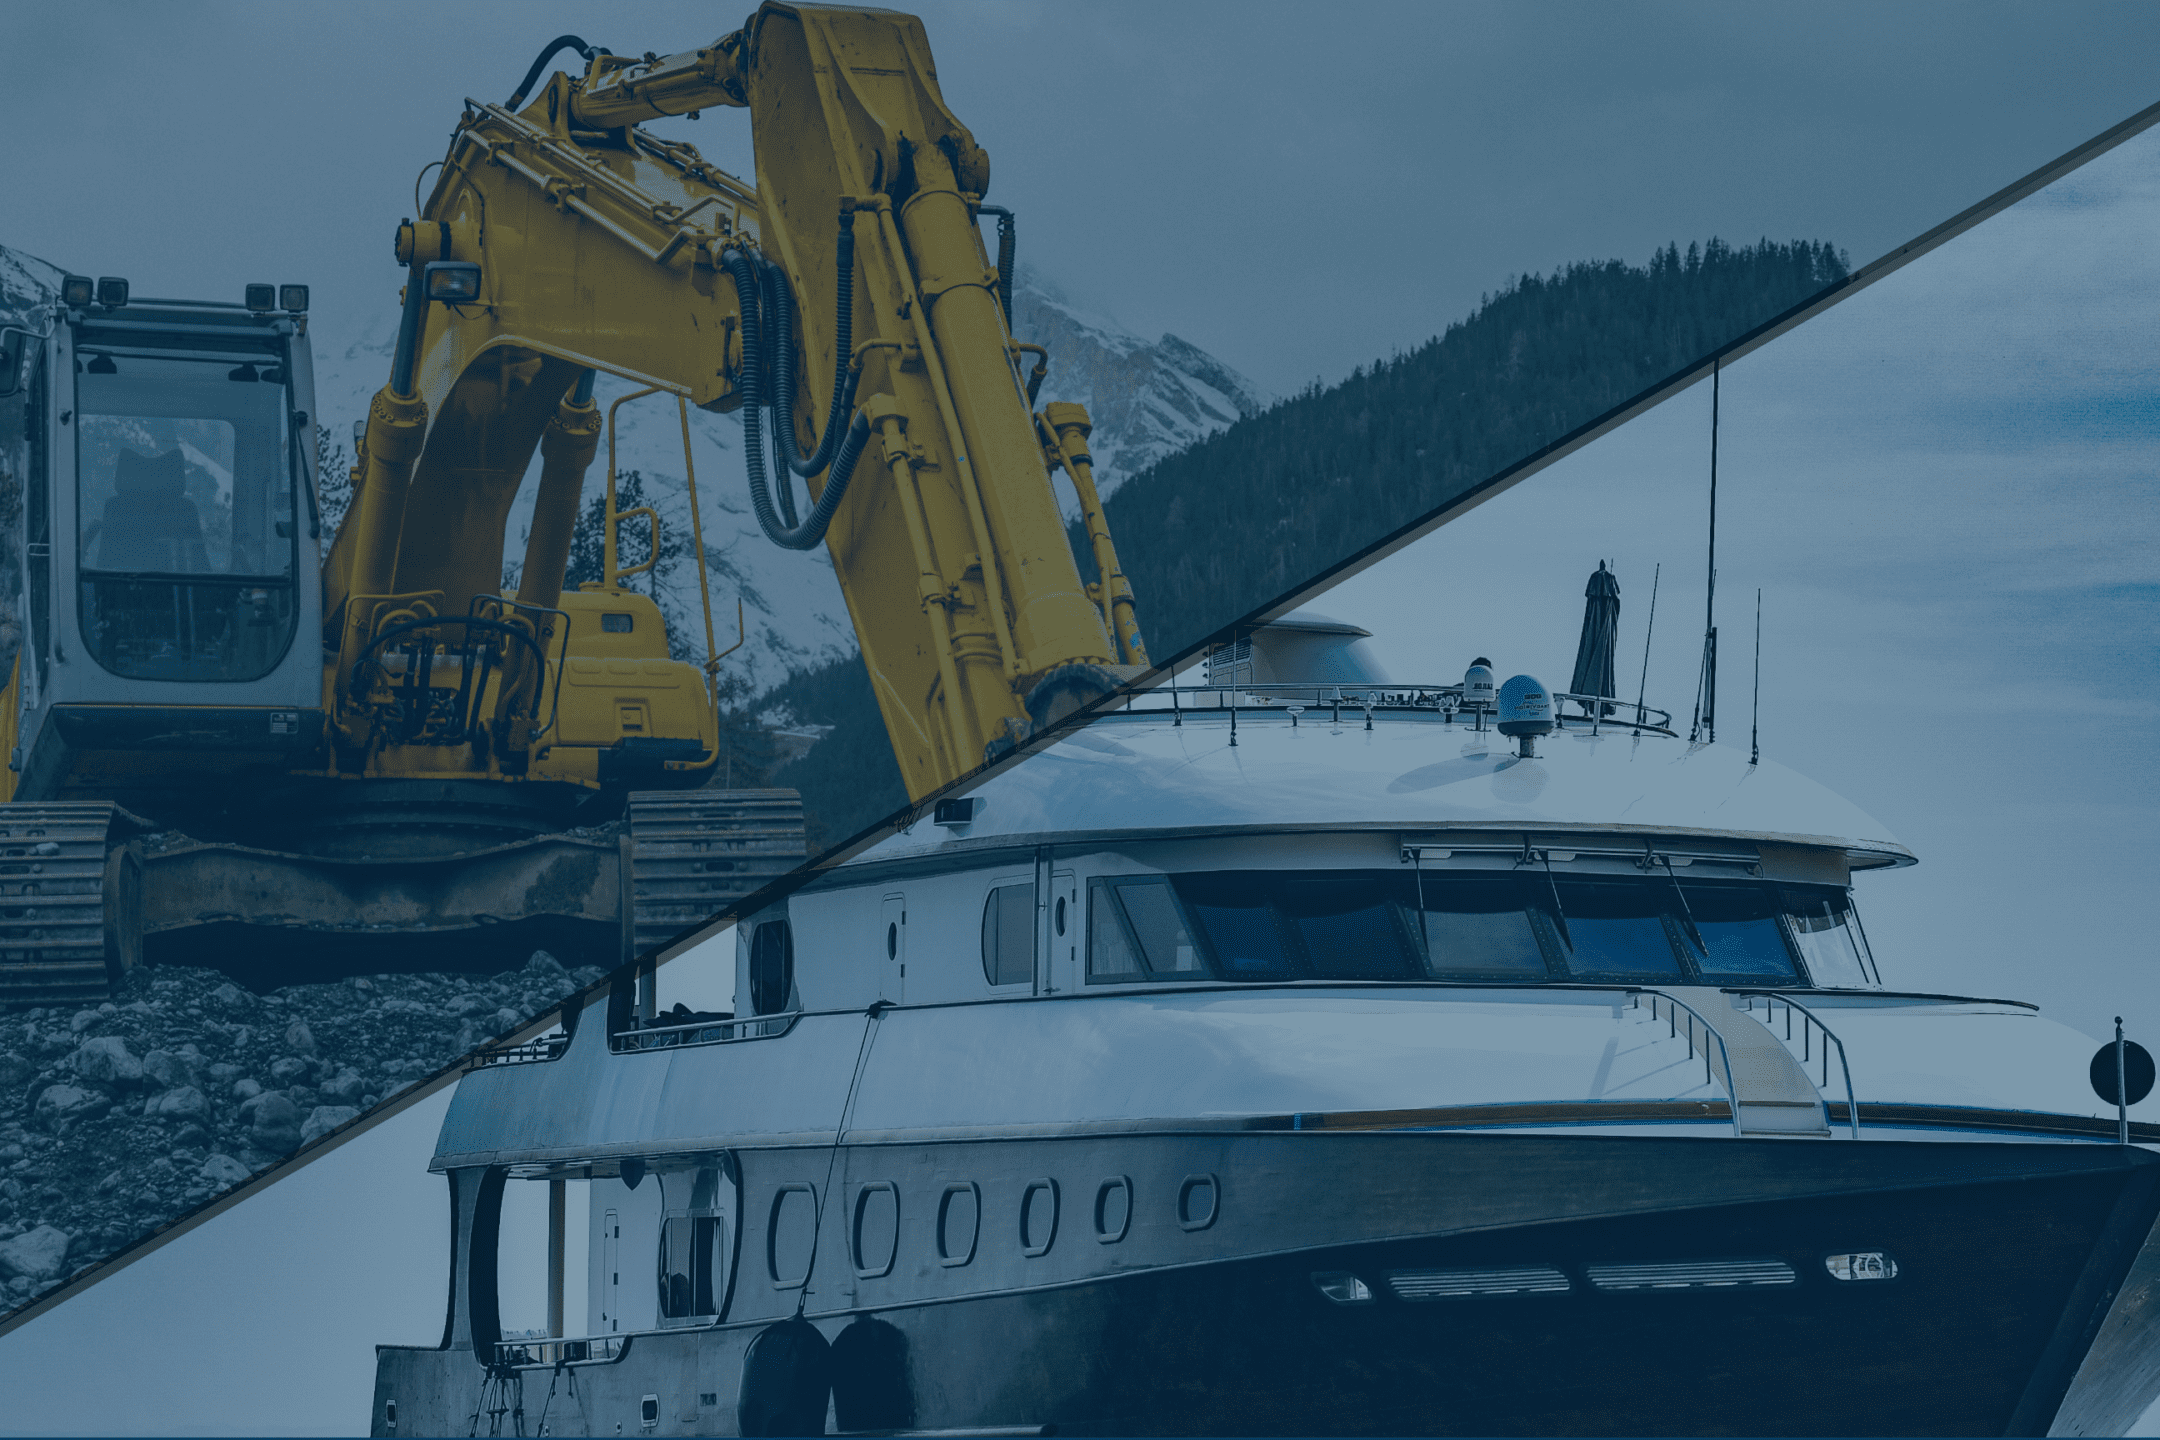 Excavator & Boat